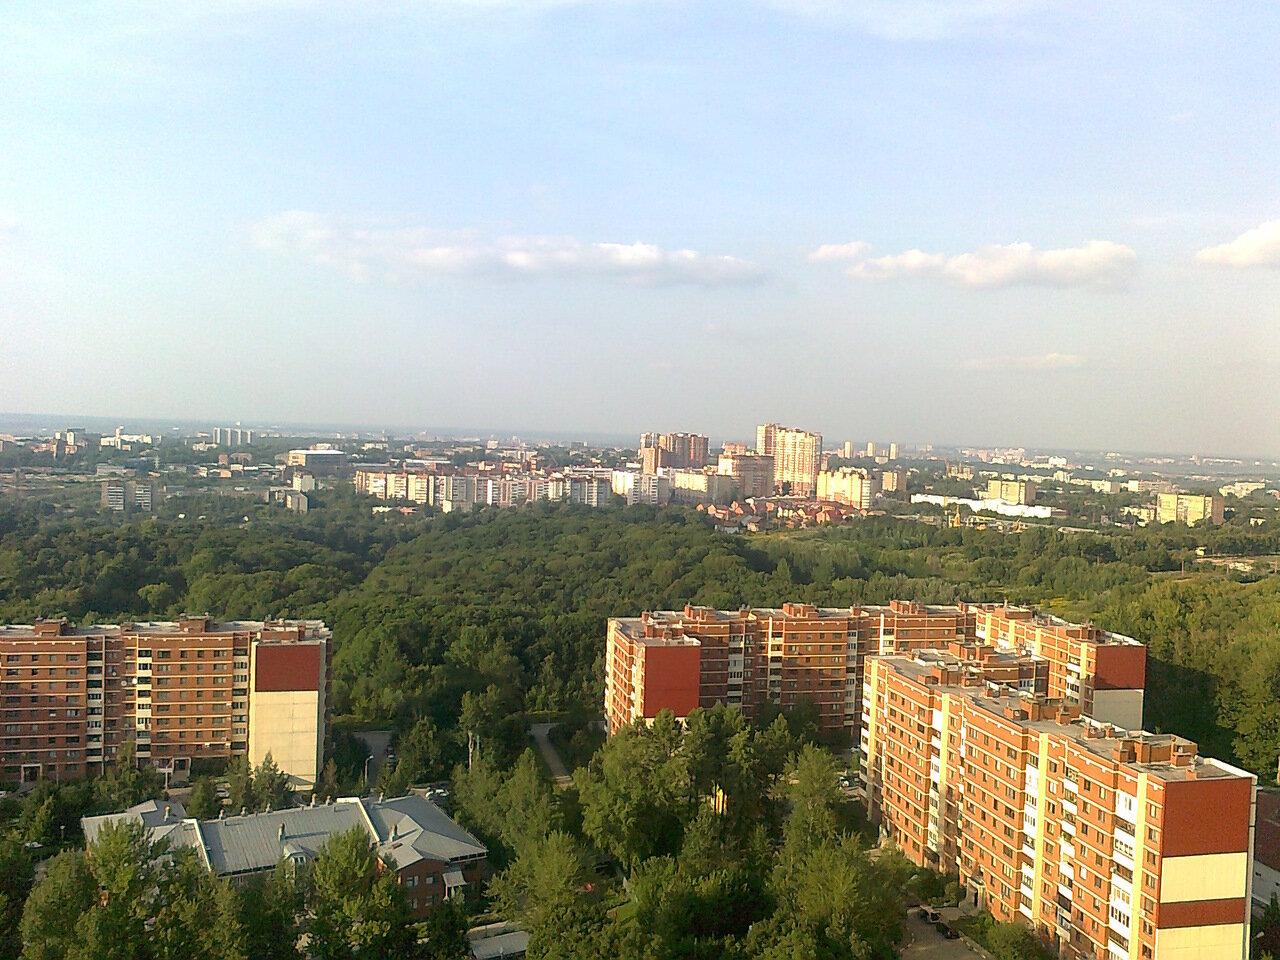 http://img-fotki.yandex.ru/get/9351/162482795.4/0_bc73d_715f359a_XXXL.jpg